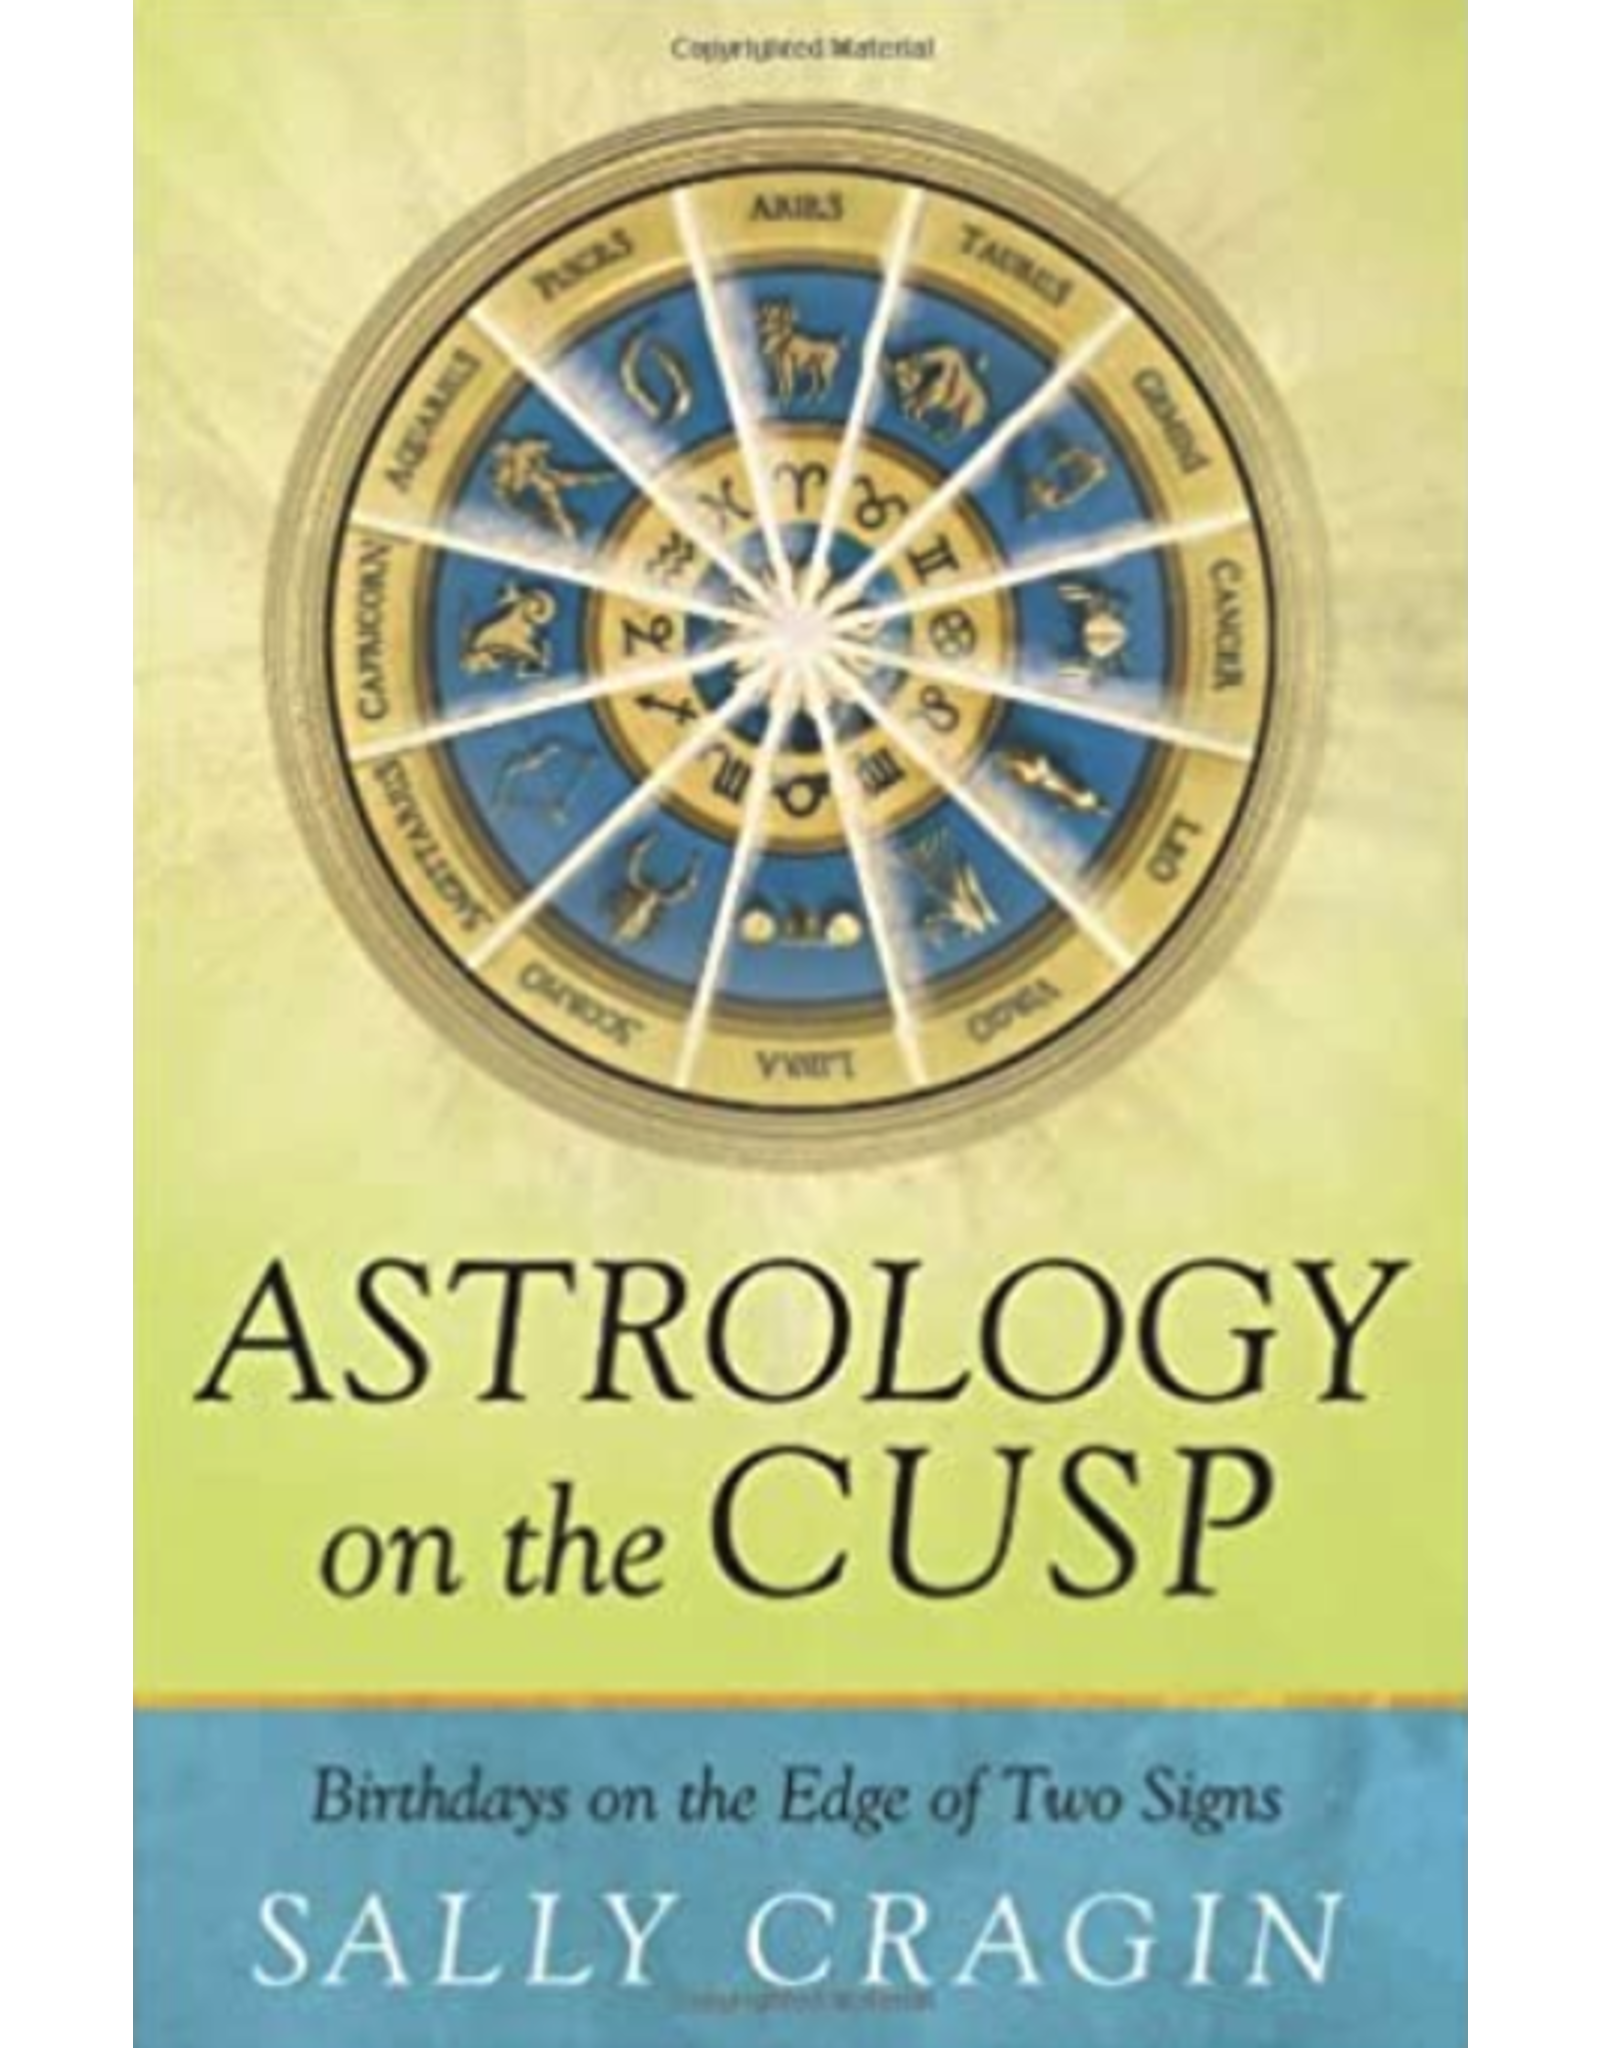 Astrology on the Cusp